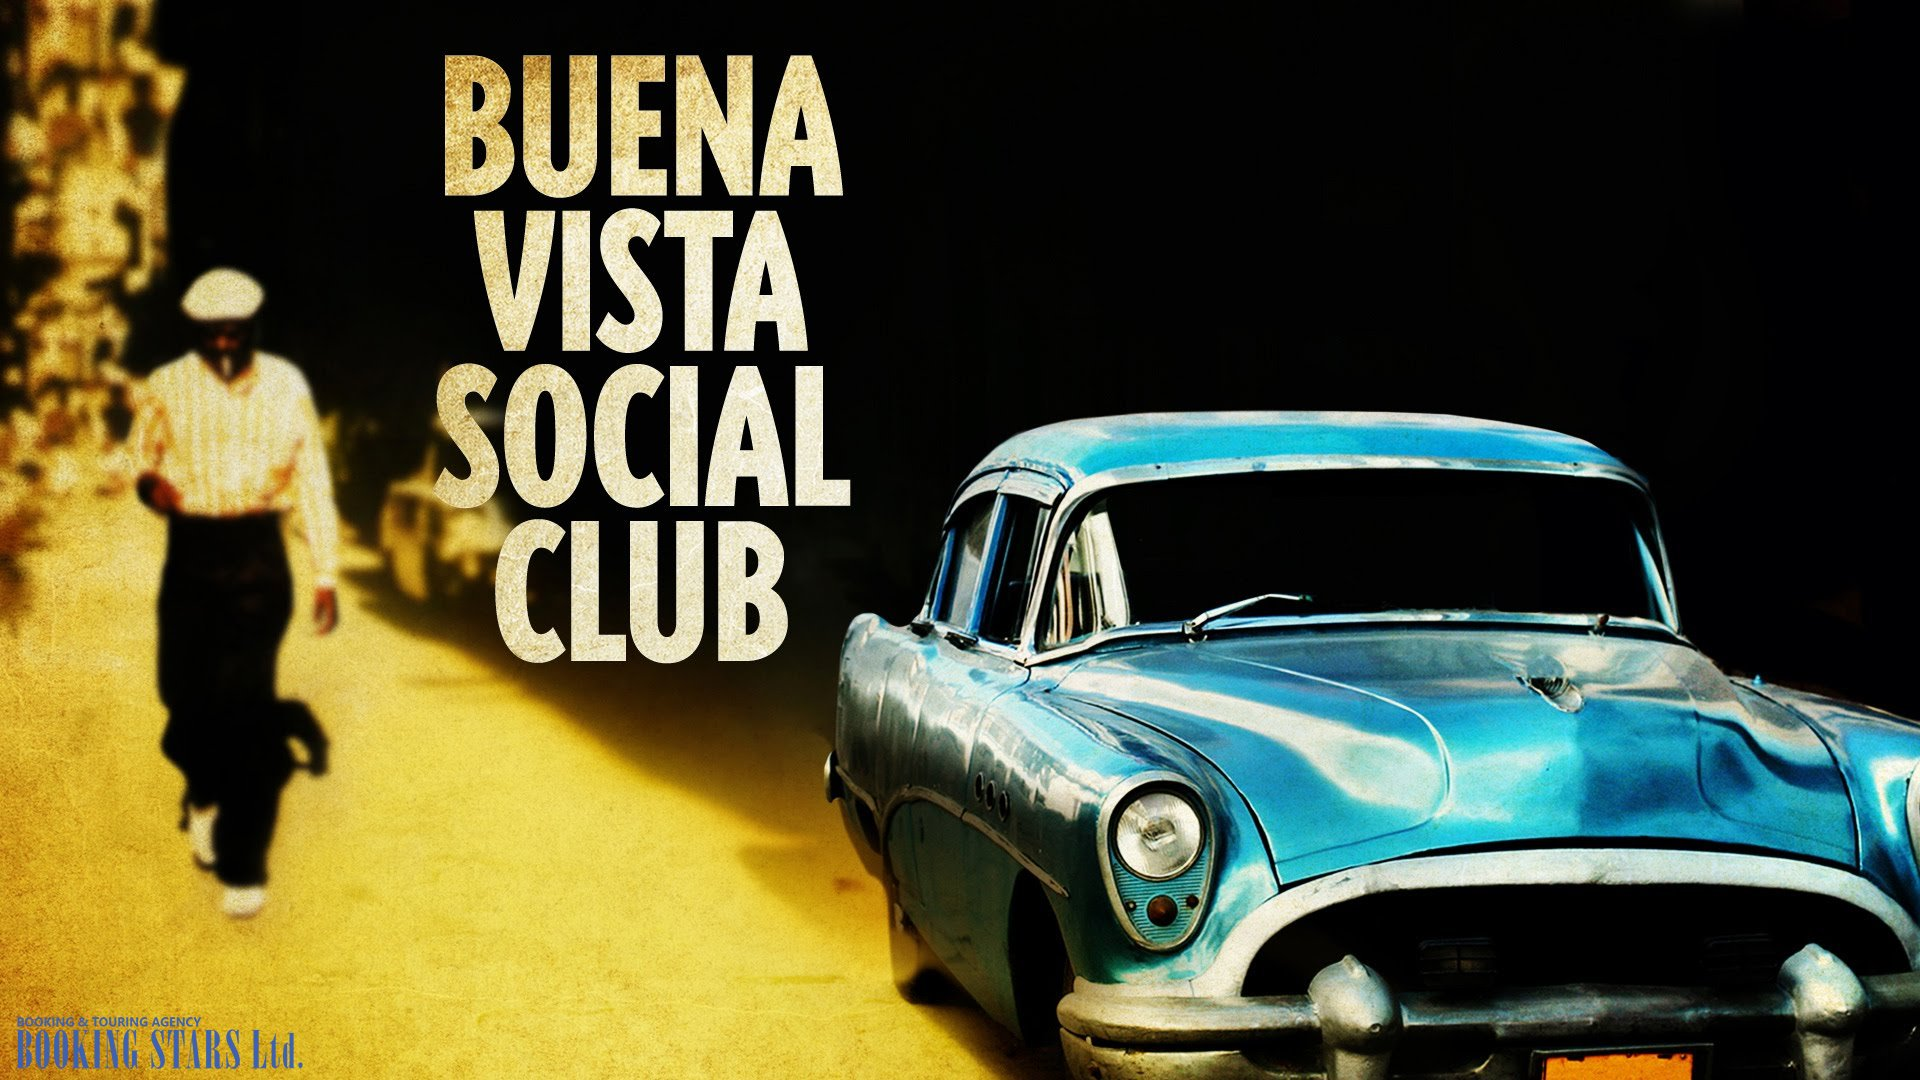 Booking Stars Ltd Booking Touring Agency Buena Vista Social Club